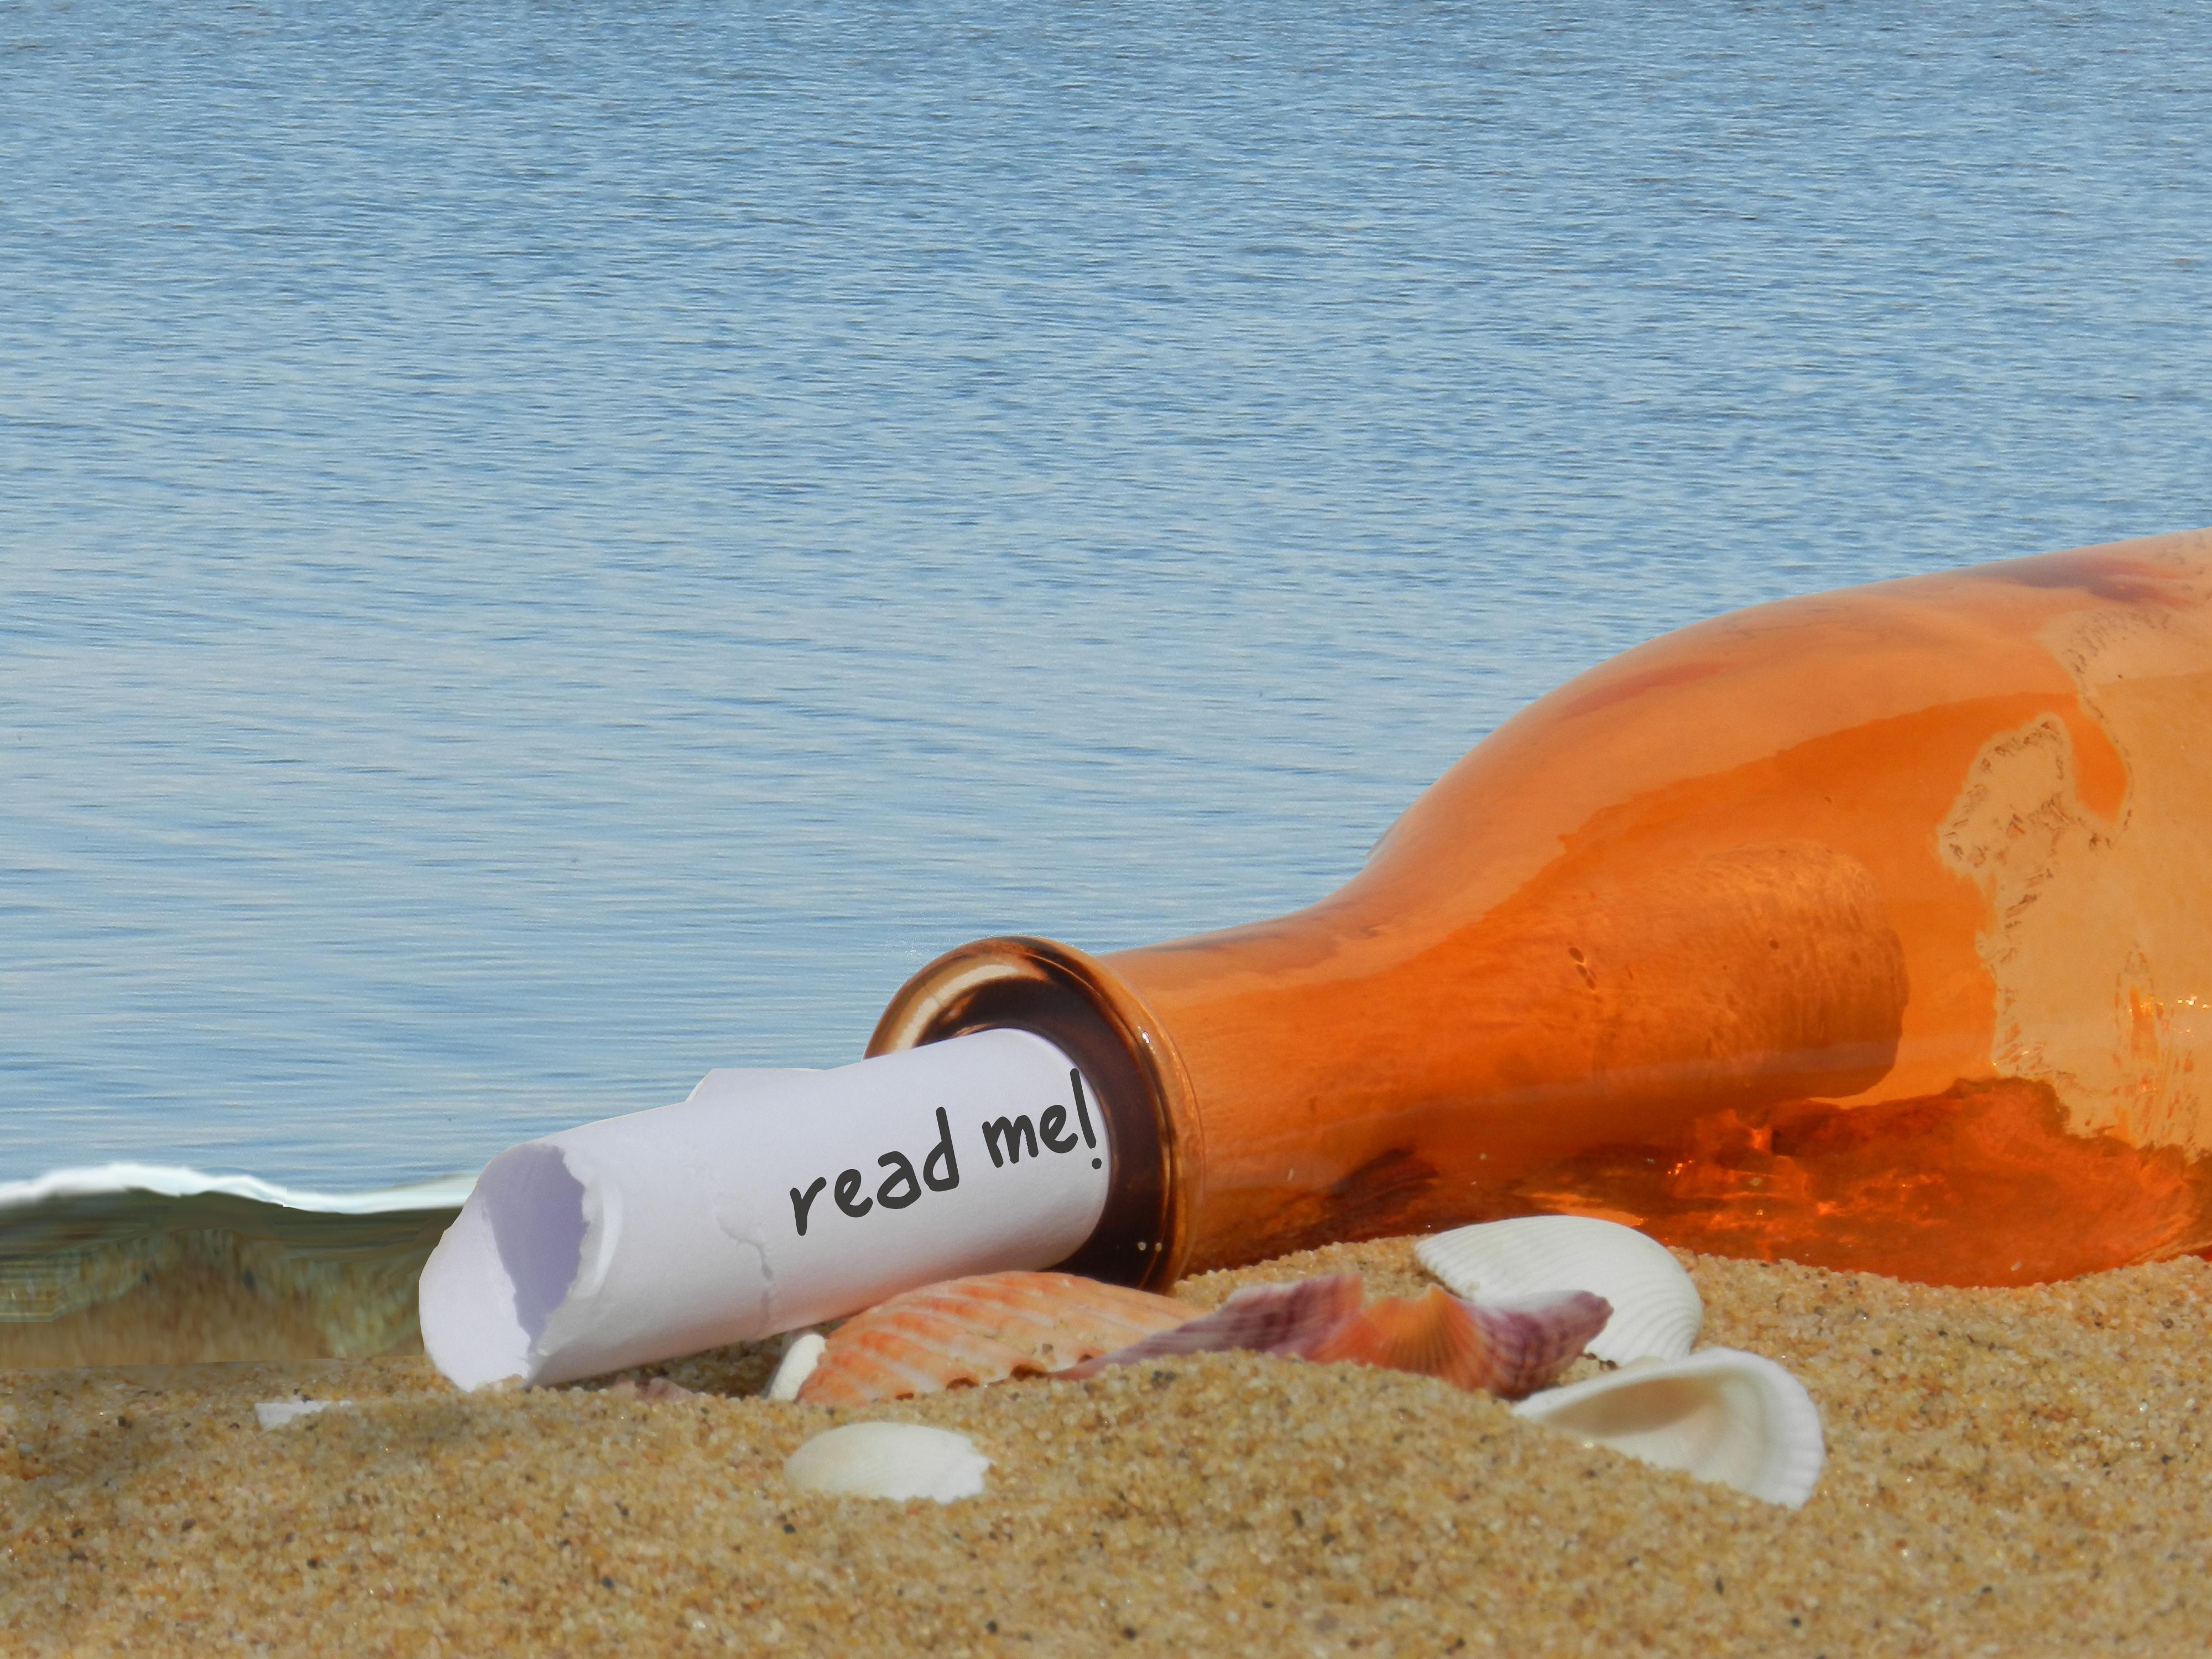 Message_in_a_bottle